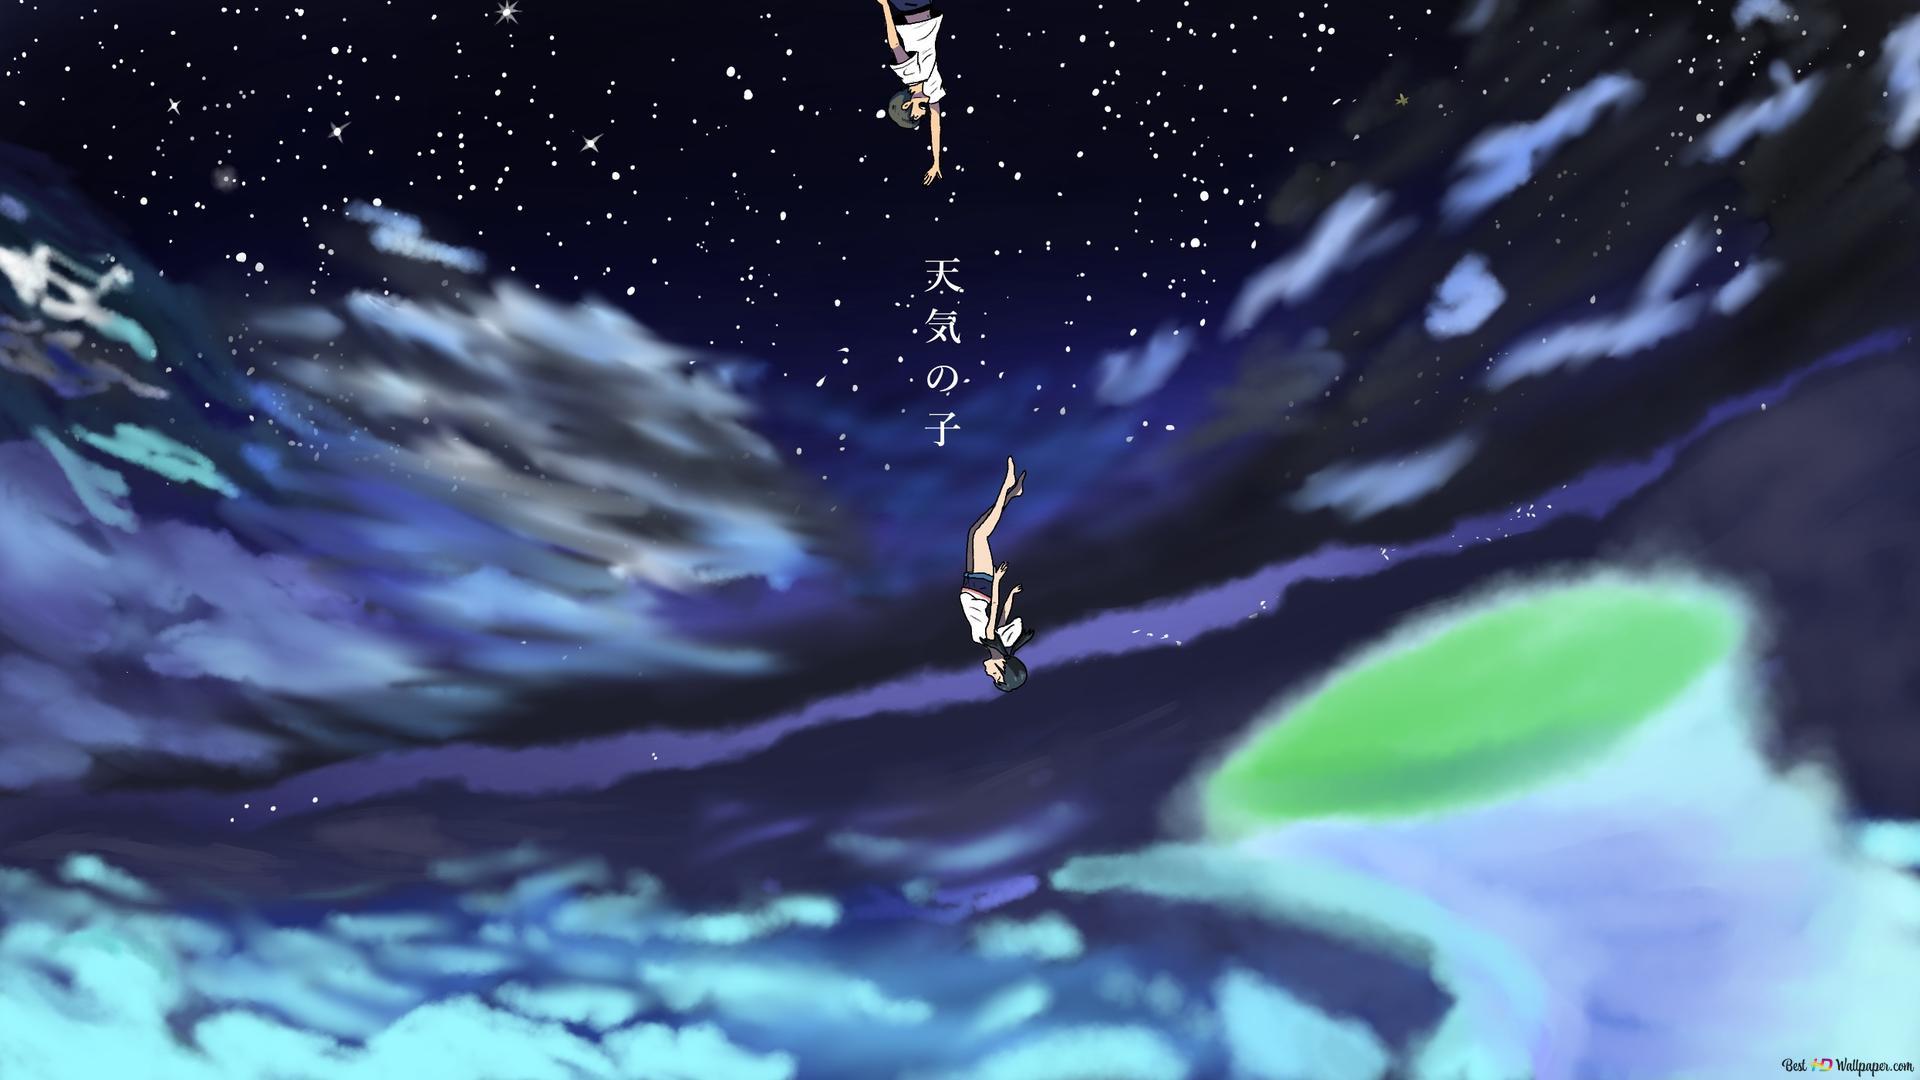 Weathering With You Hodaka Morishima Hina Amano Hd Wallpaper Download